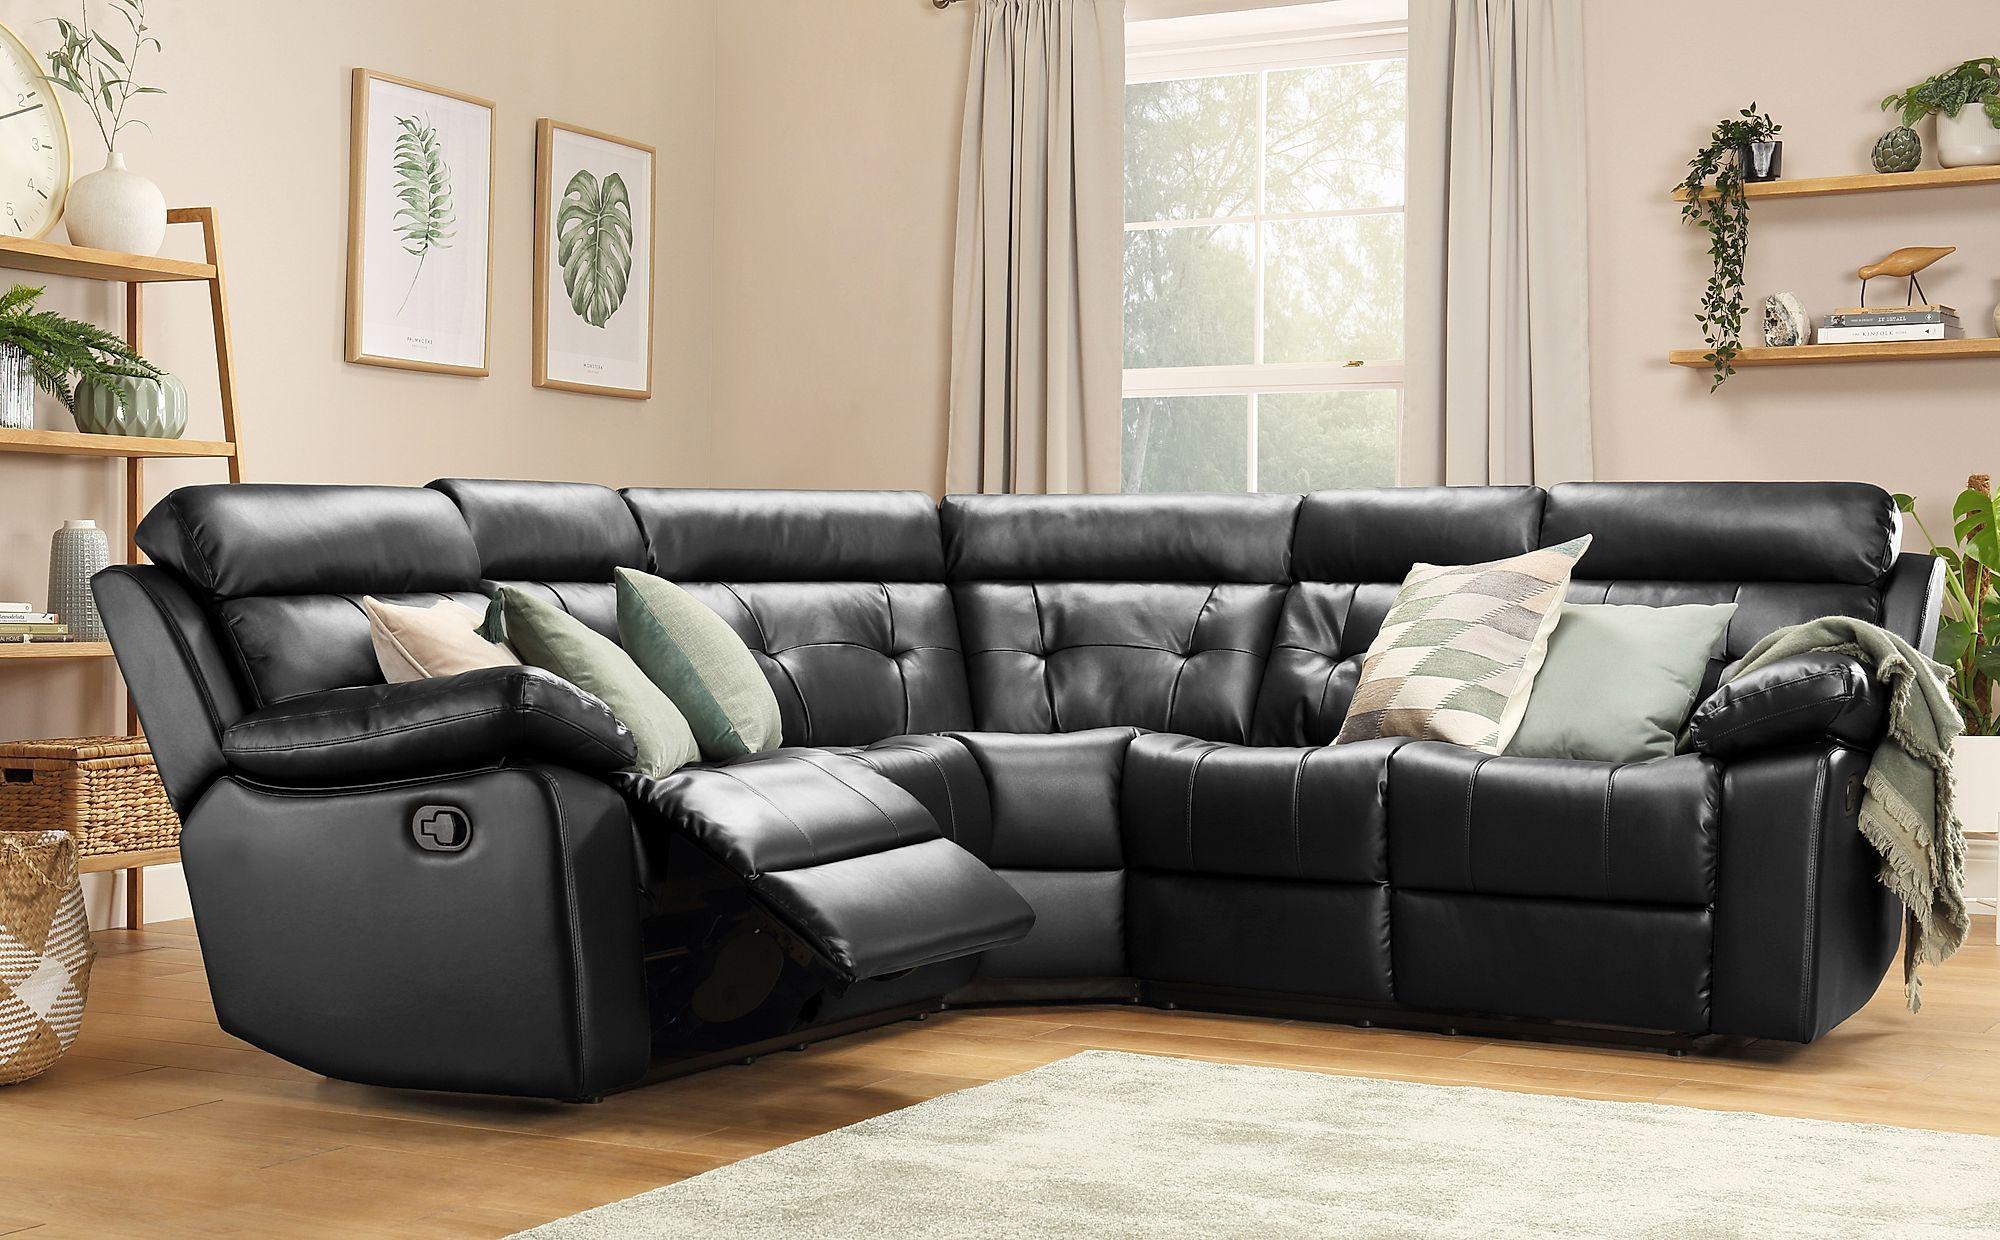 Grosvenor Black Leather Recliner Corner Sofa Only £1099.99 ...